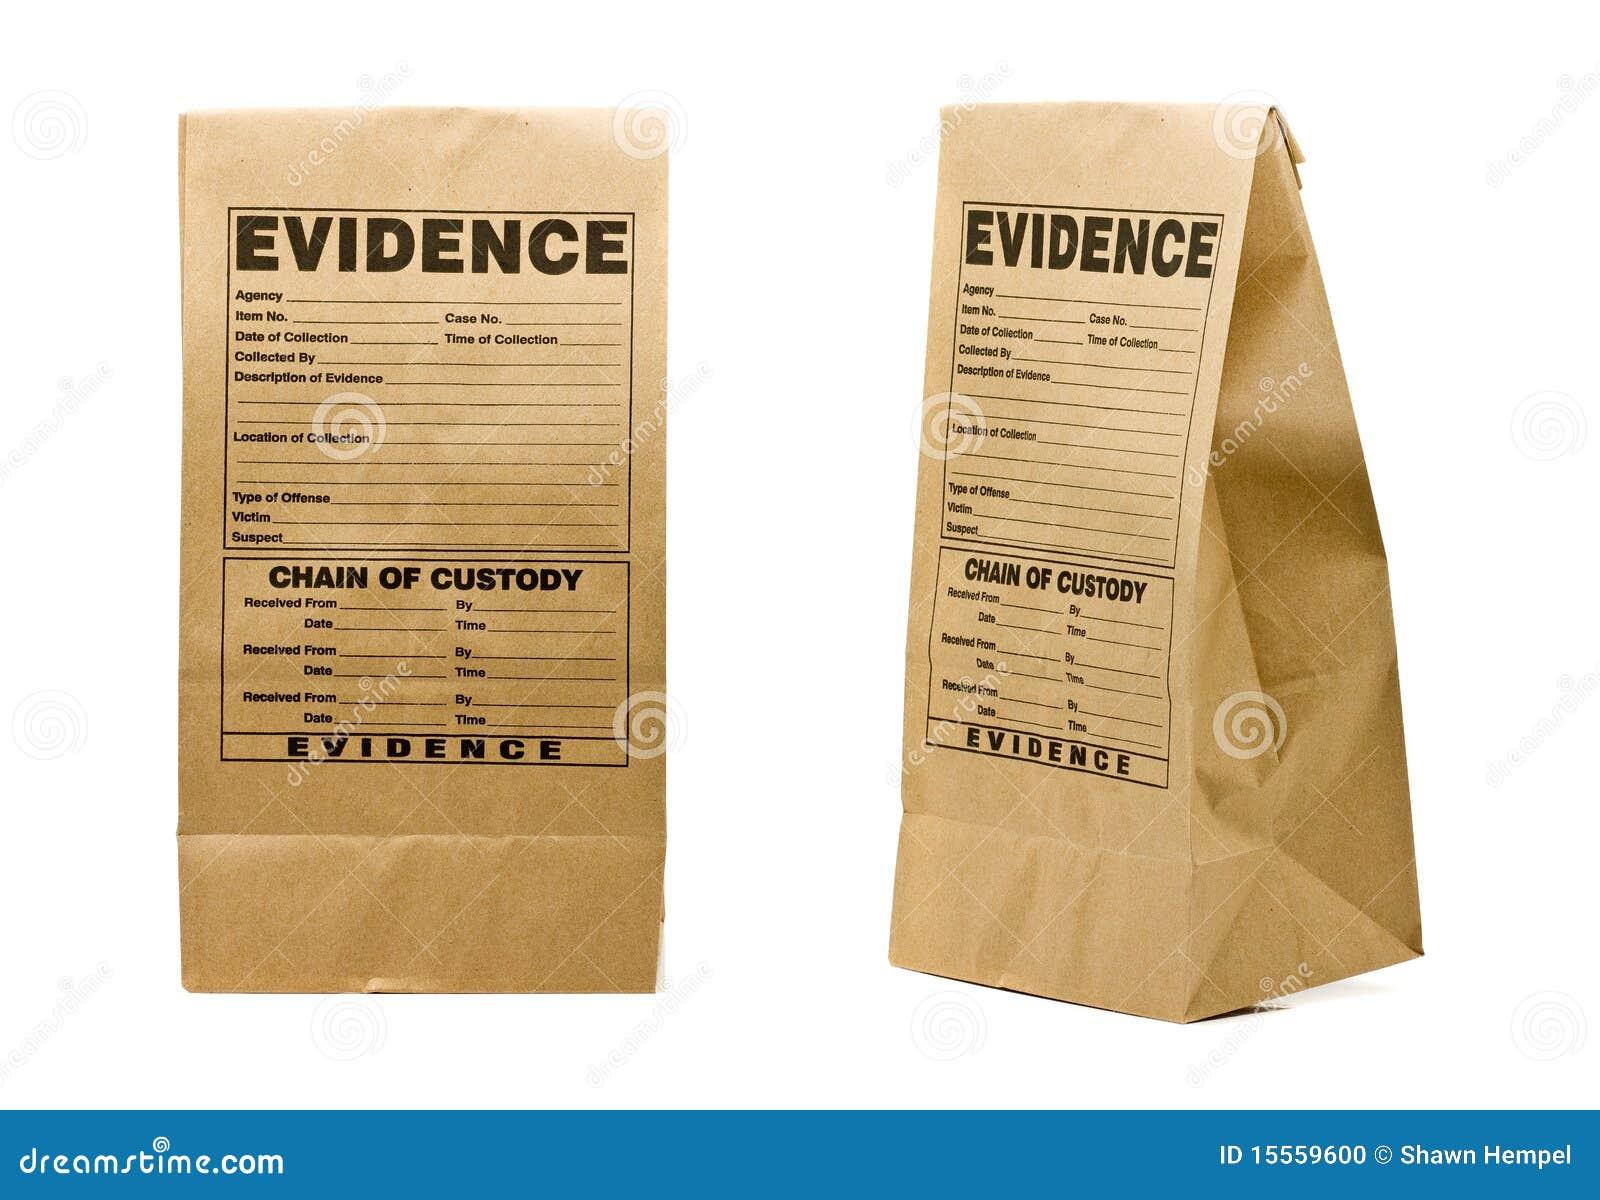 http://thumbs.dreamstime.com/z/evidence-bag-15559600.jpg